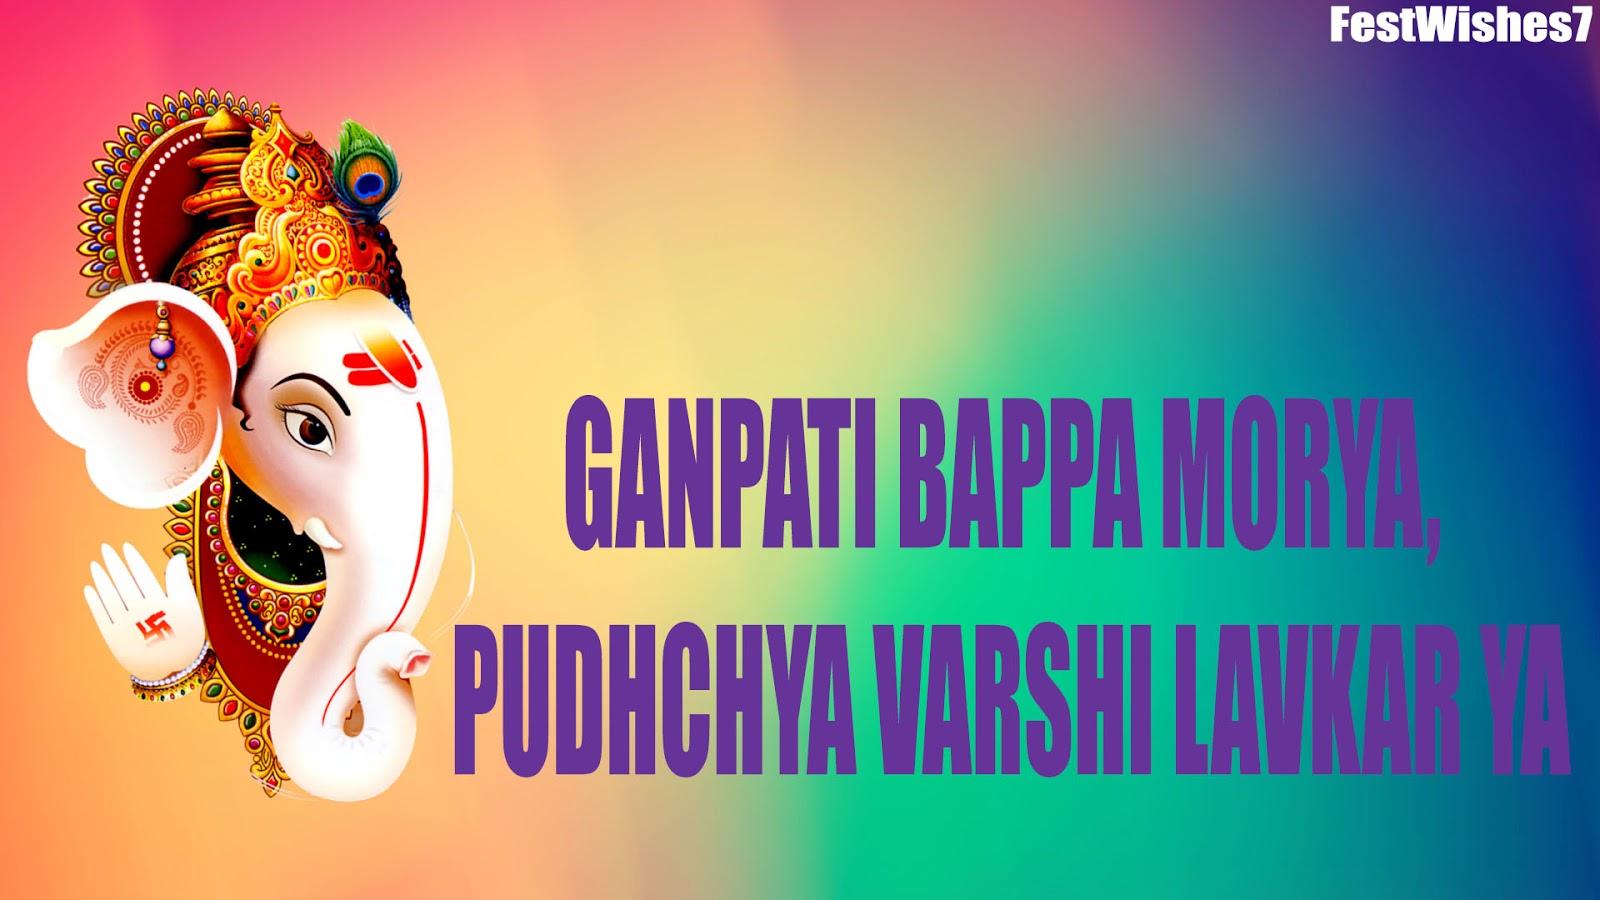 Happy Ganpati Visarjan 2018 Images Status Wishes Quotes Slogans